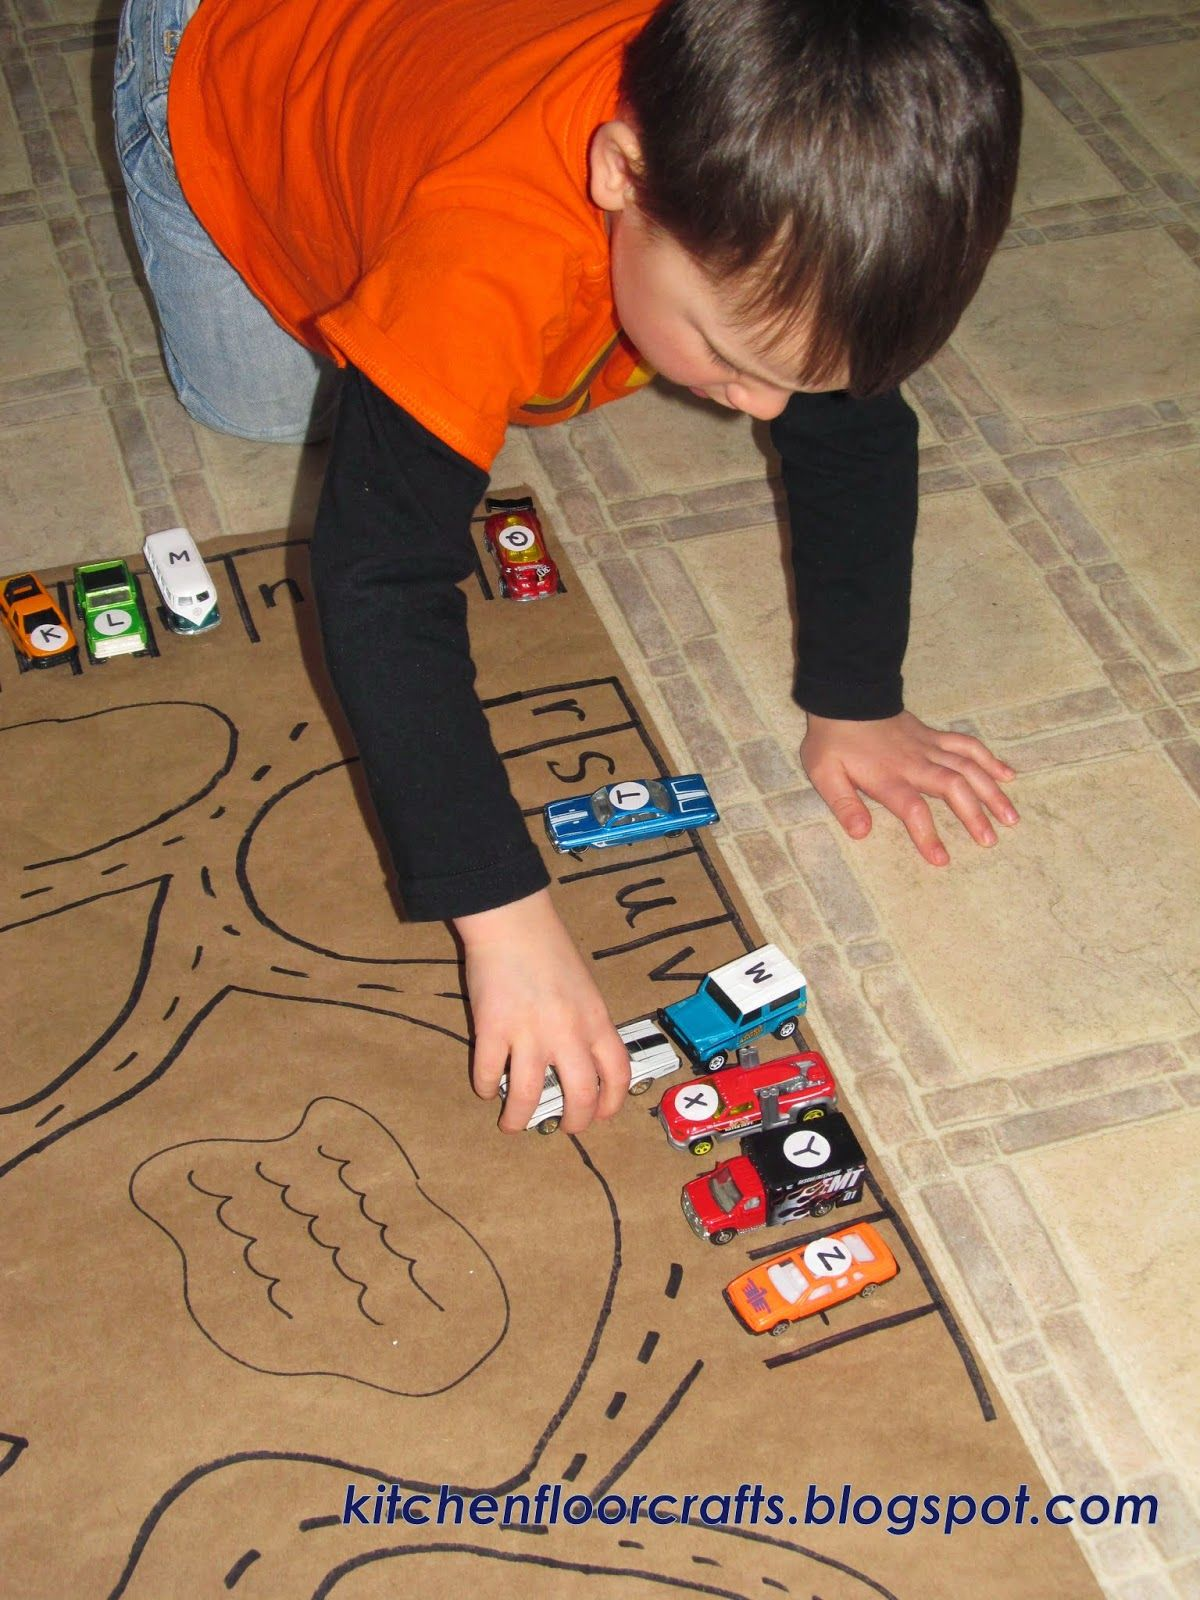 Kitchen Floor Crafts Letter Match Race Car Village